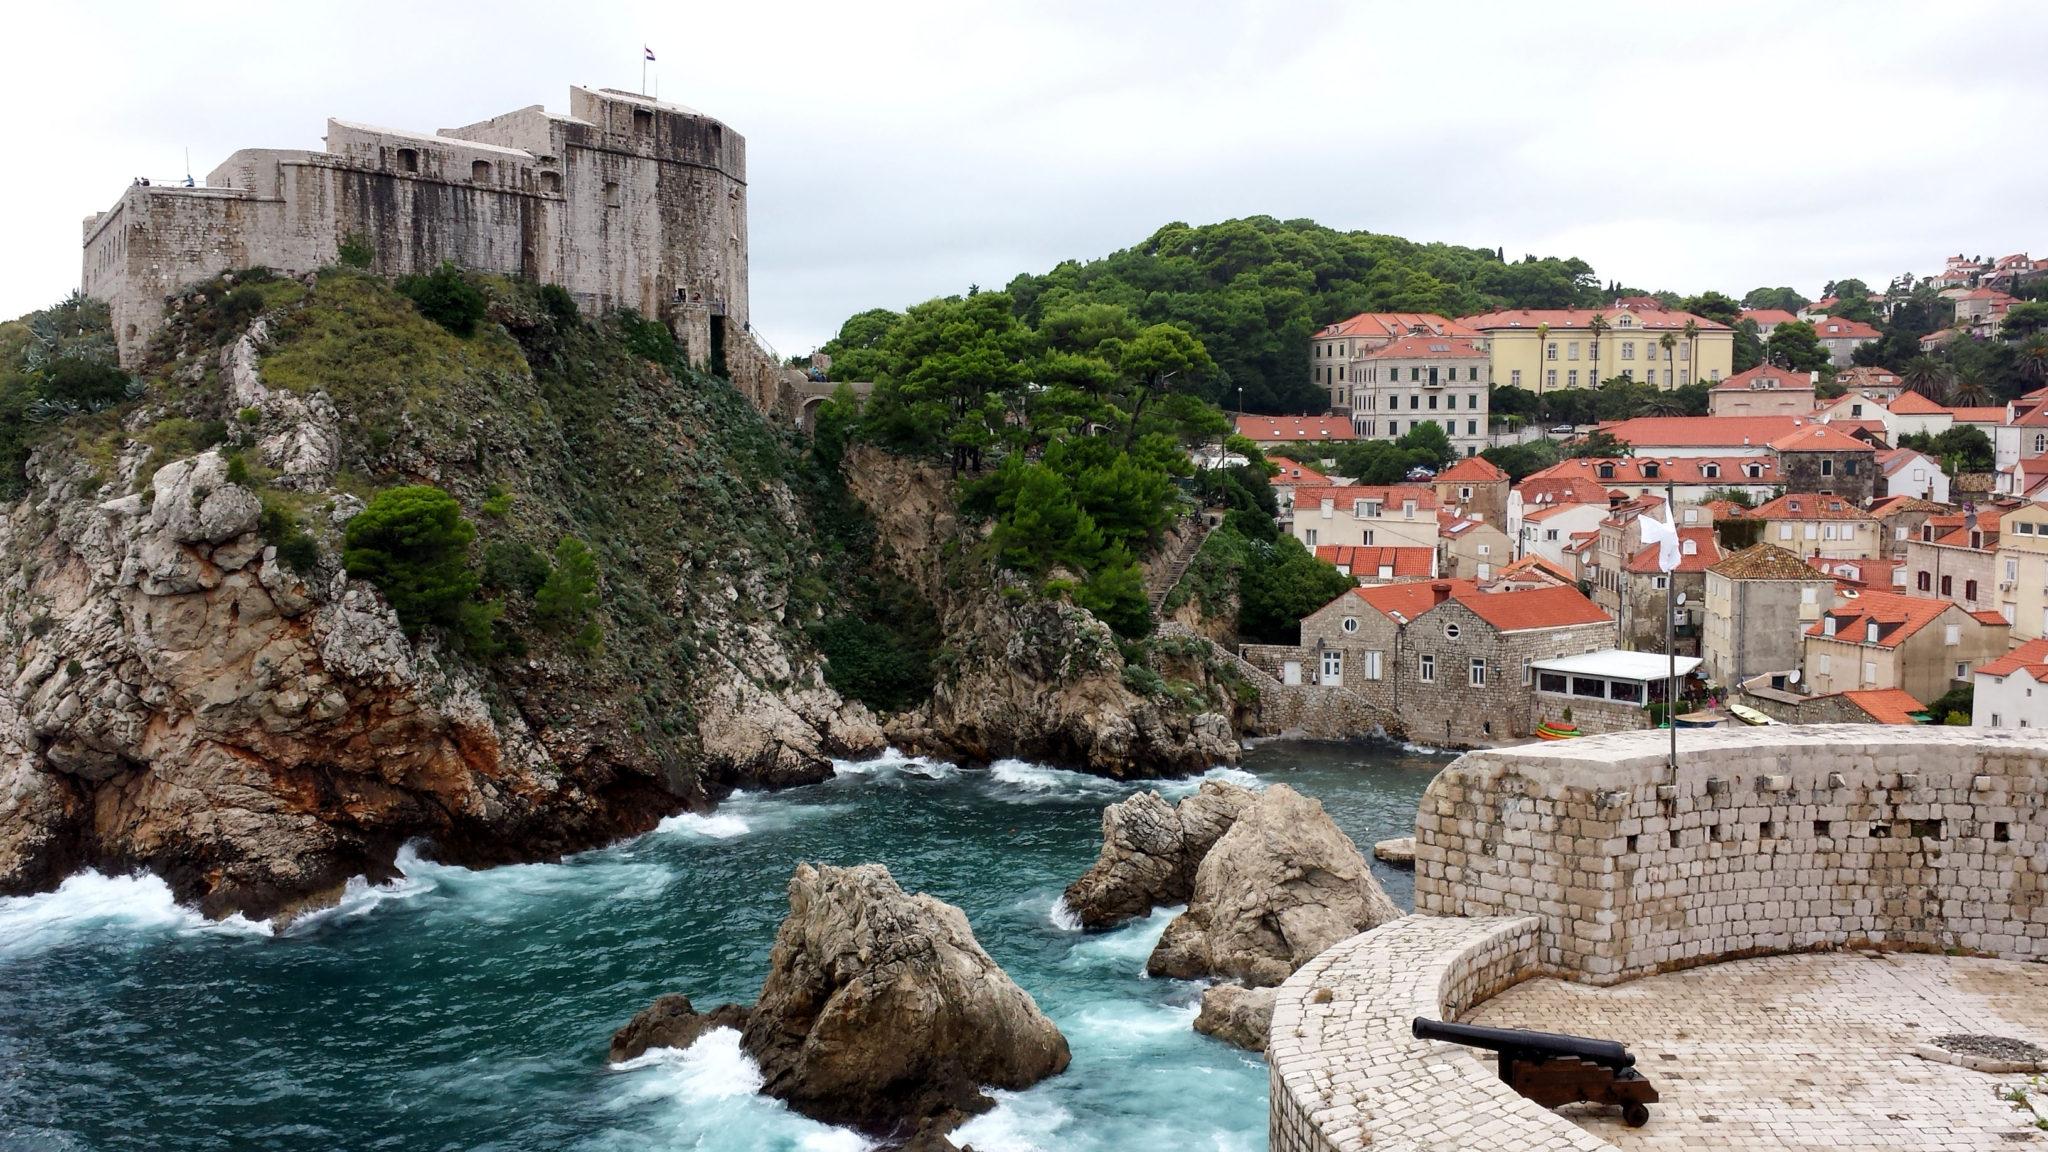 Hema_blog_mode_voyage_croatie_une_journee_a_dubrovnik_paysage_11